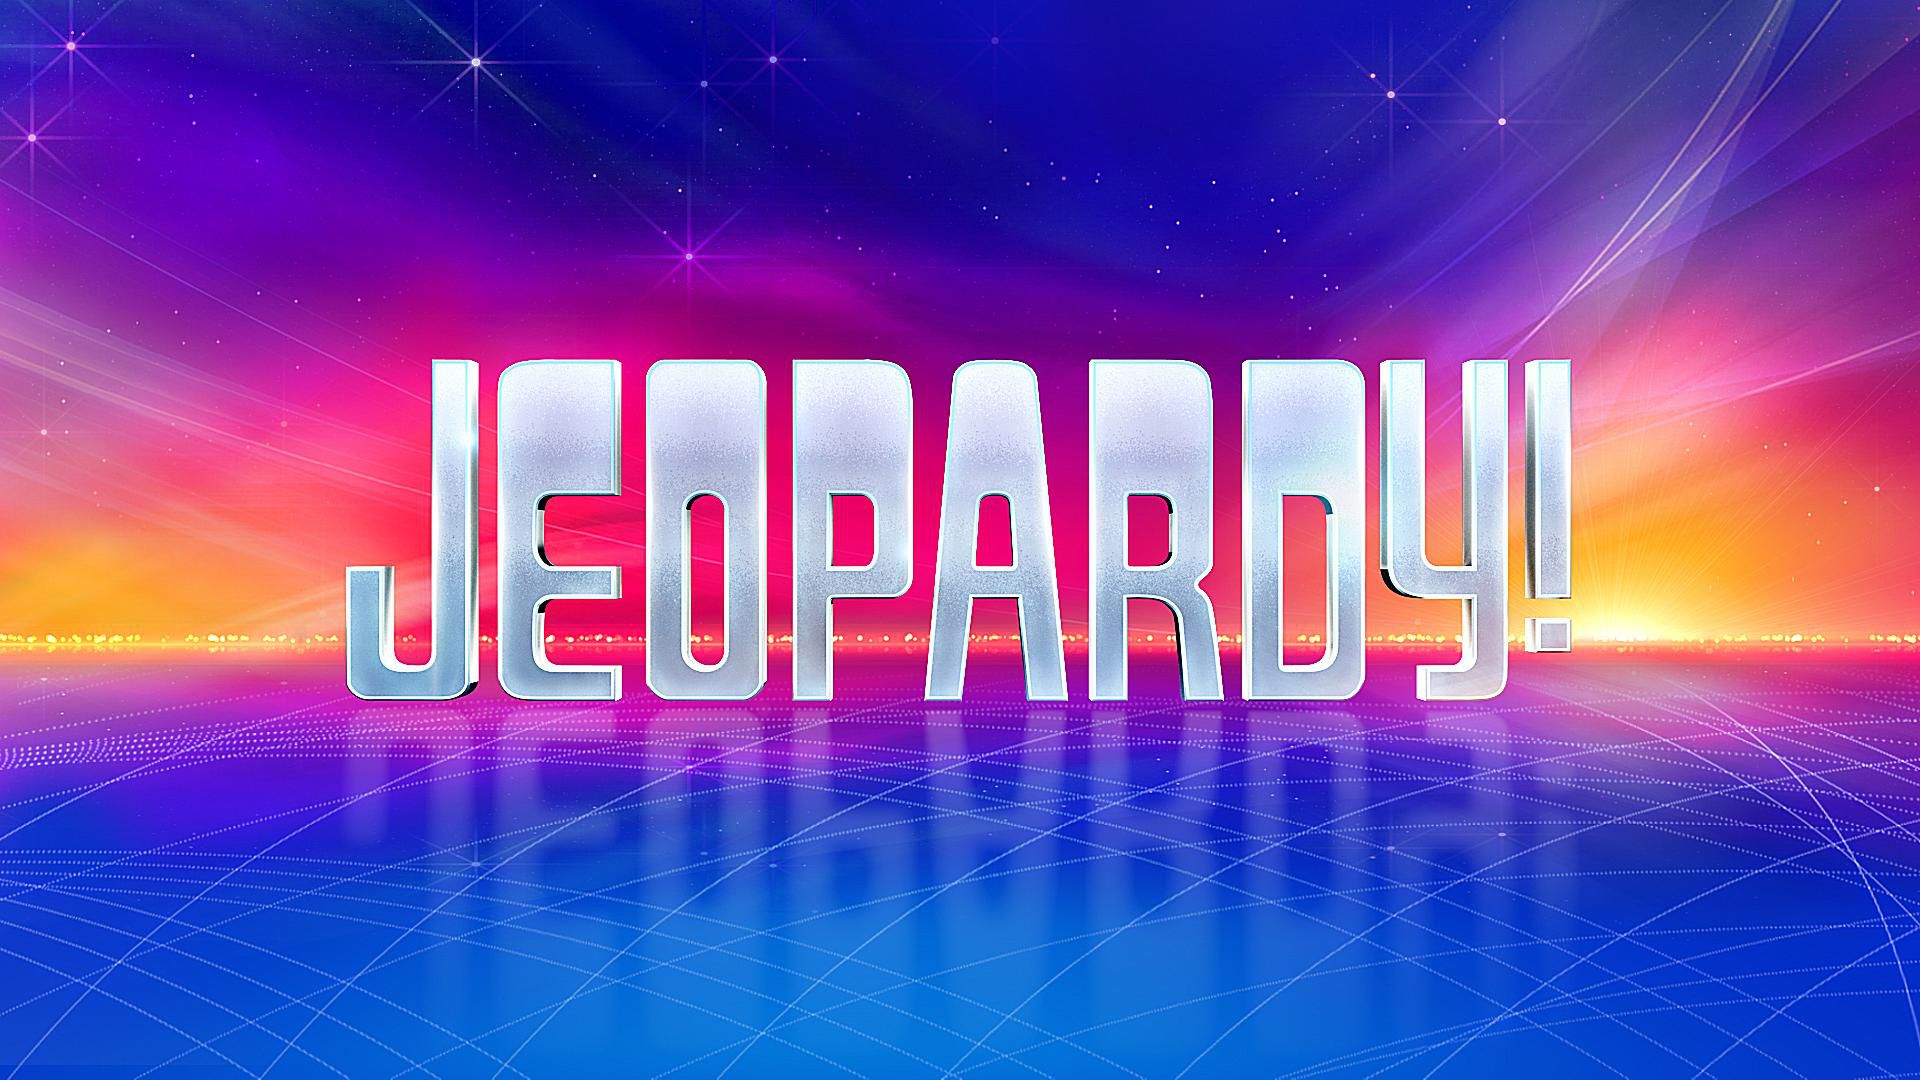 'Jeopardy!': A Brief History